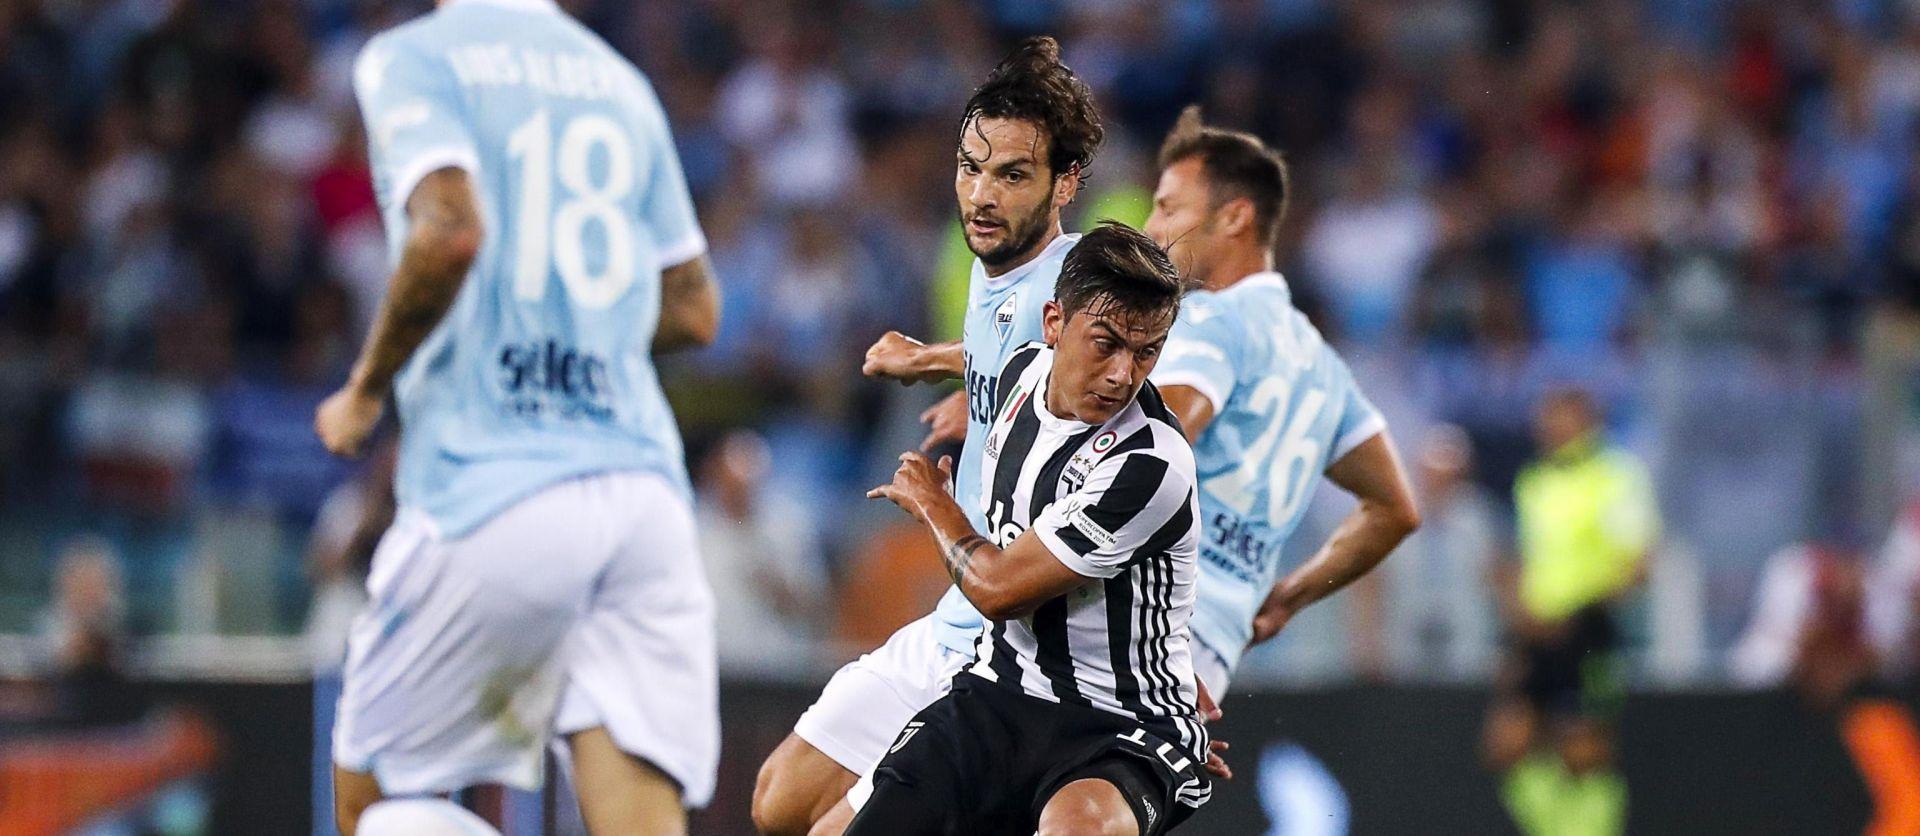 VIDEO: SUPERCOPPA Lazio svladao Juventus za prvi trofej sezone